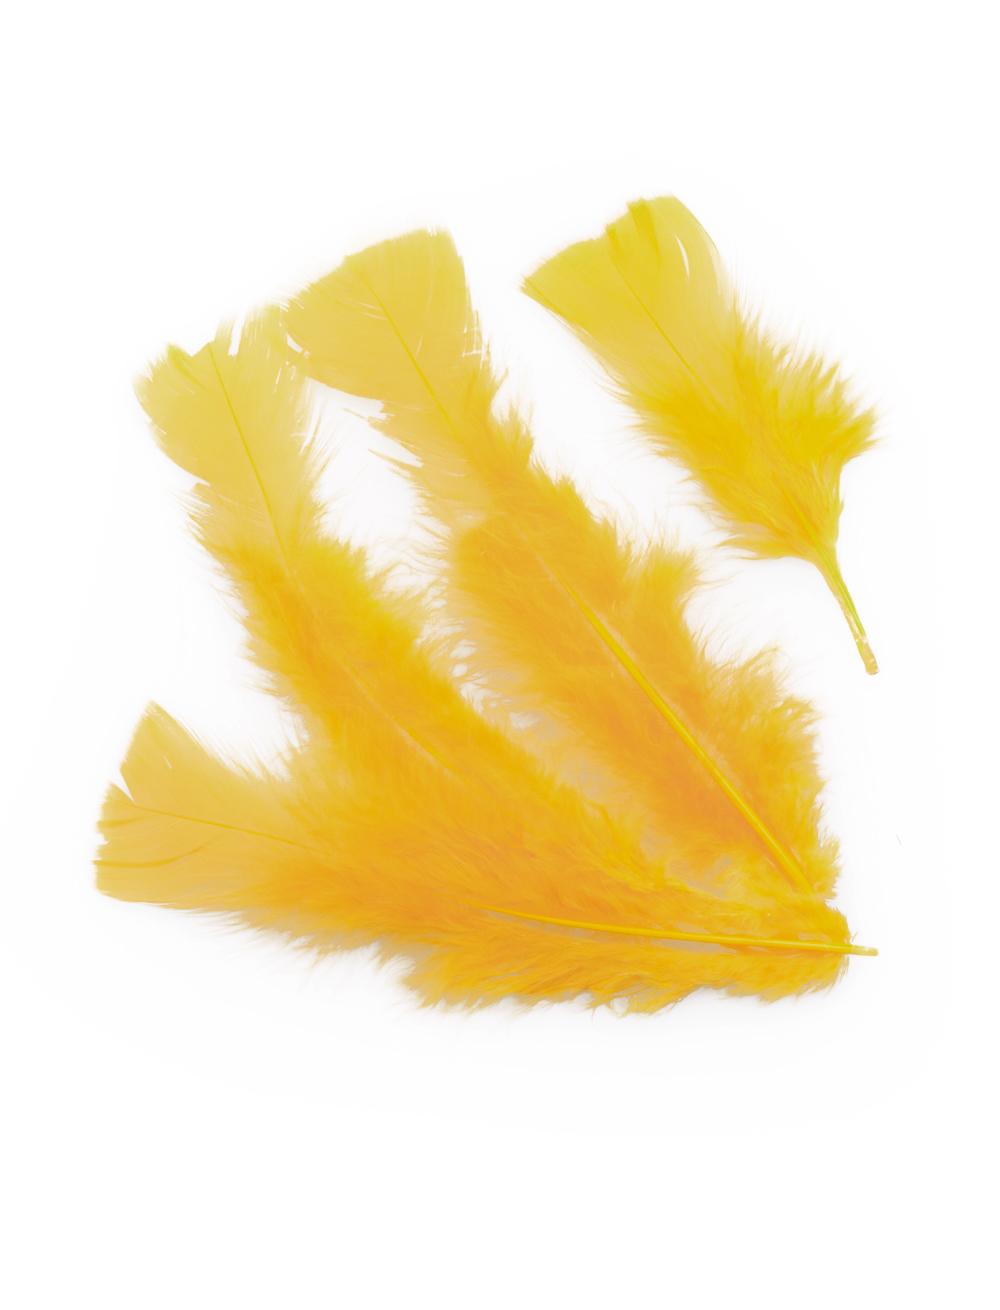 Kostuemzubehor Federn 100er-Pack gelb